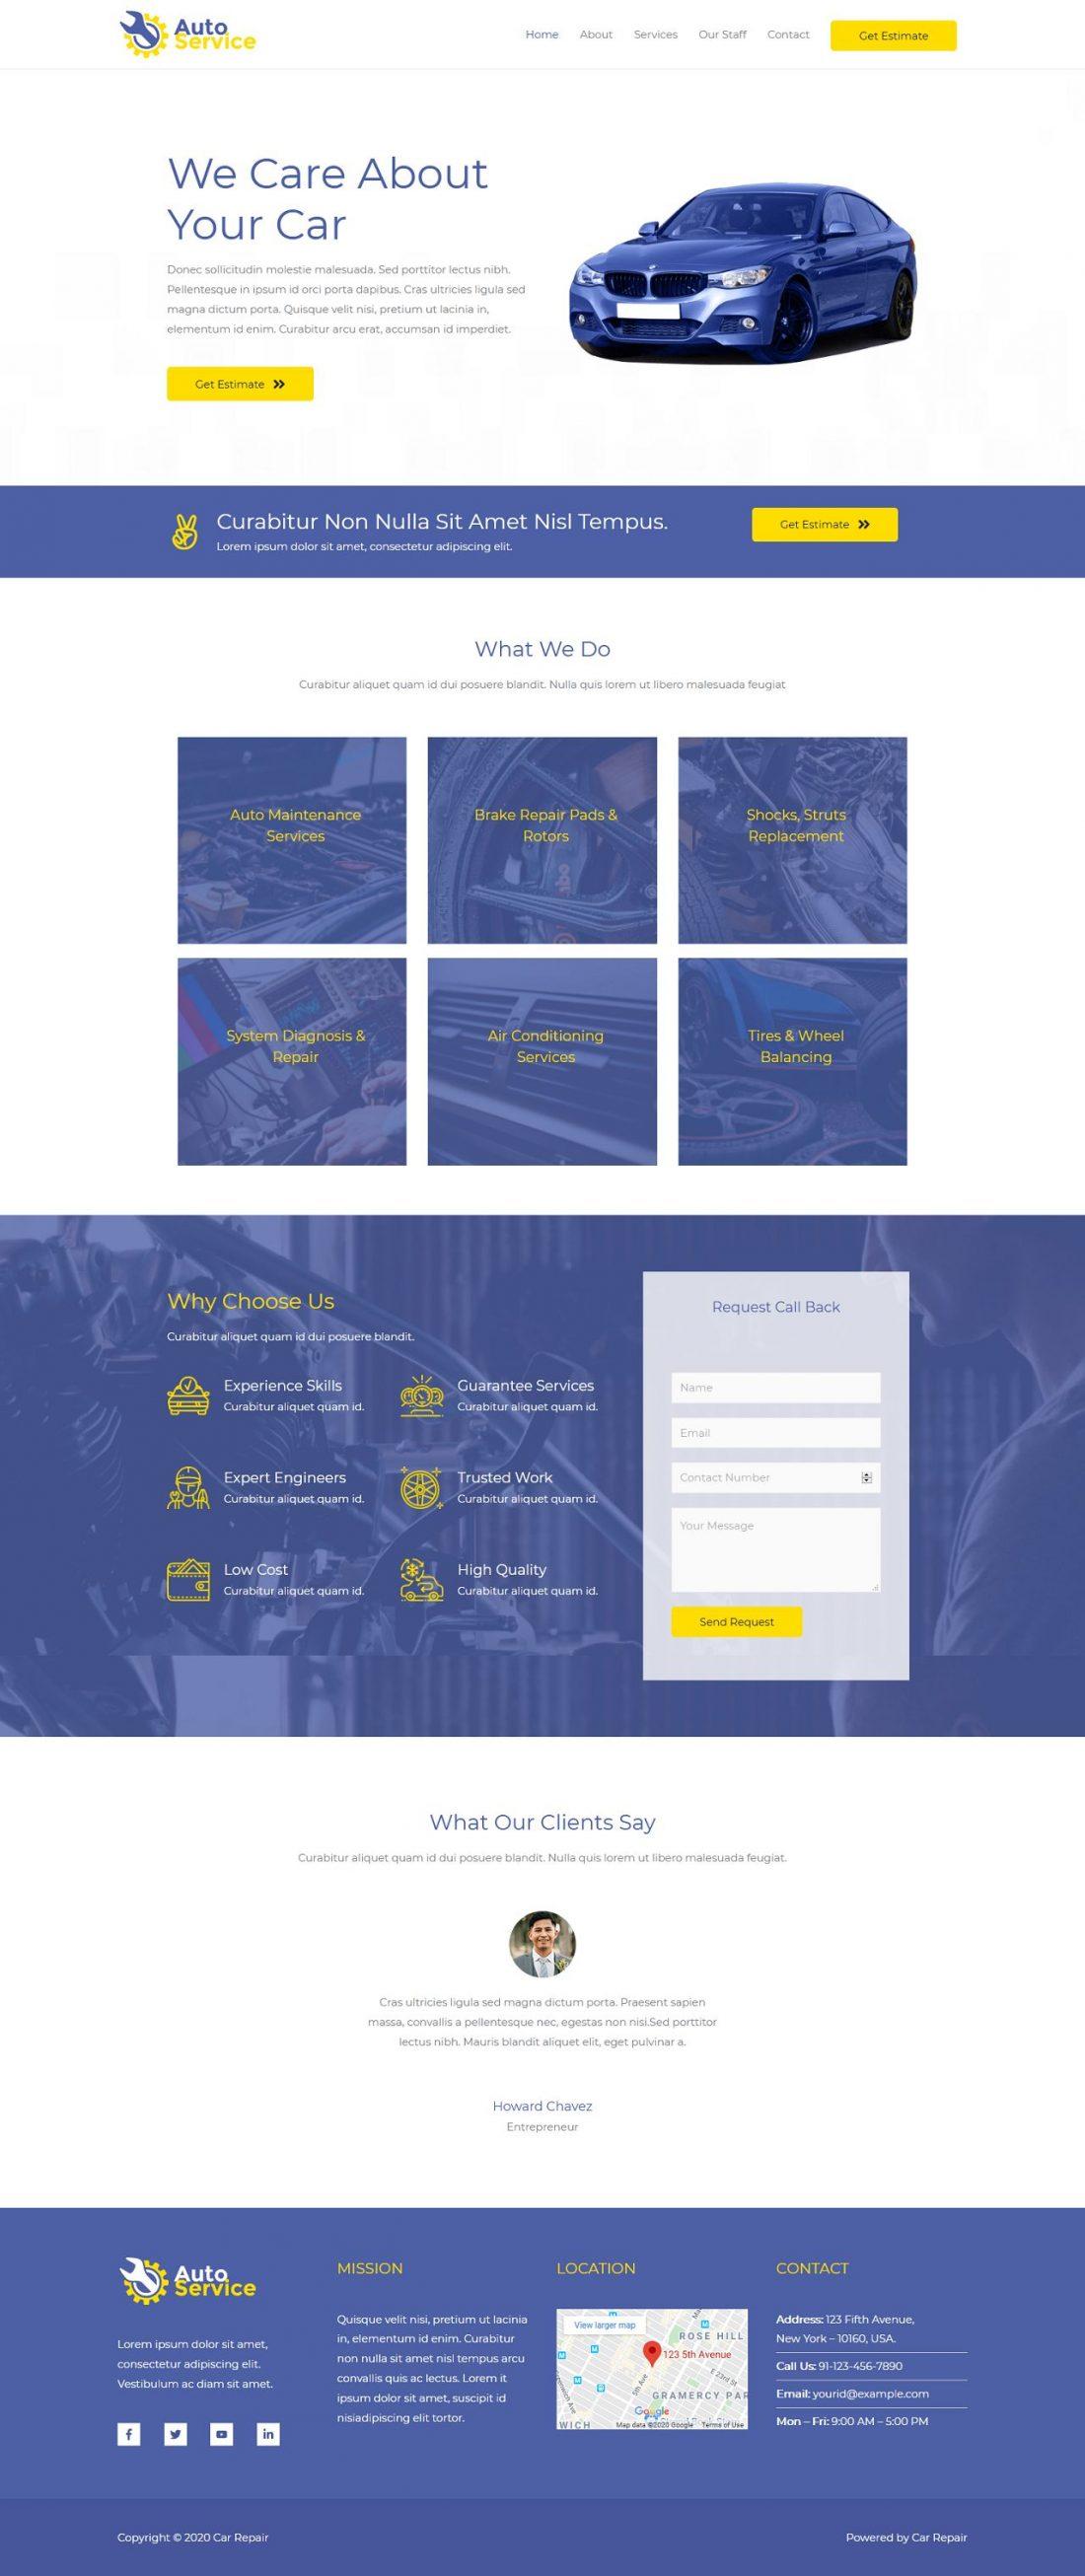 Fagowi.com Website Design Templates For Car and Auto Repair - Home Page Image